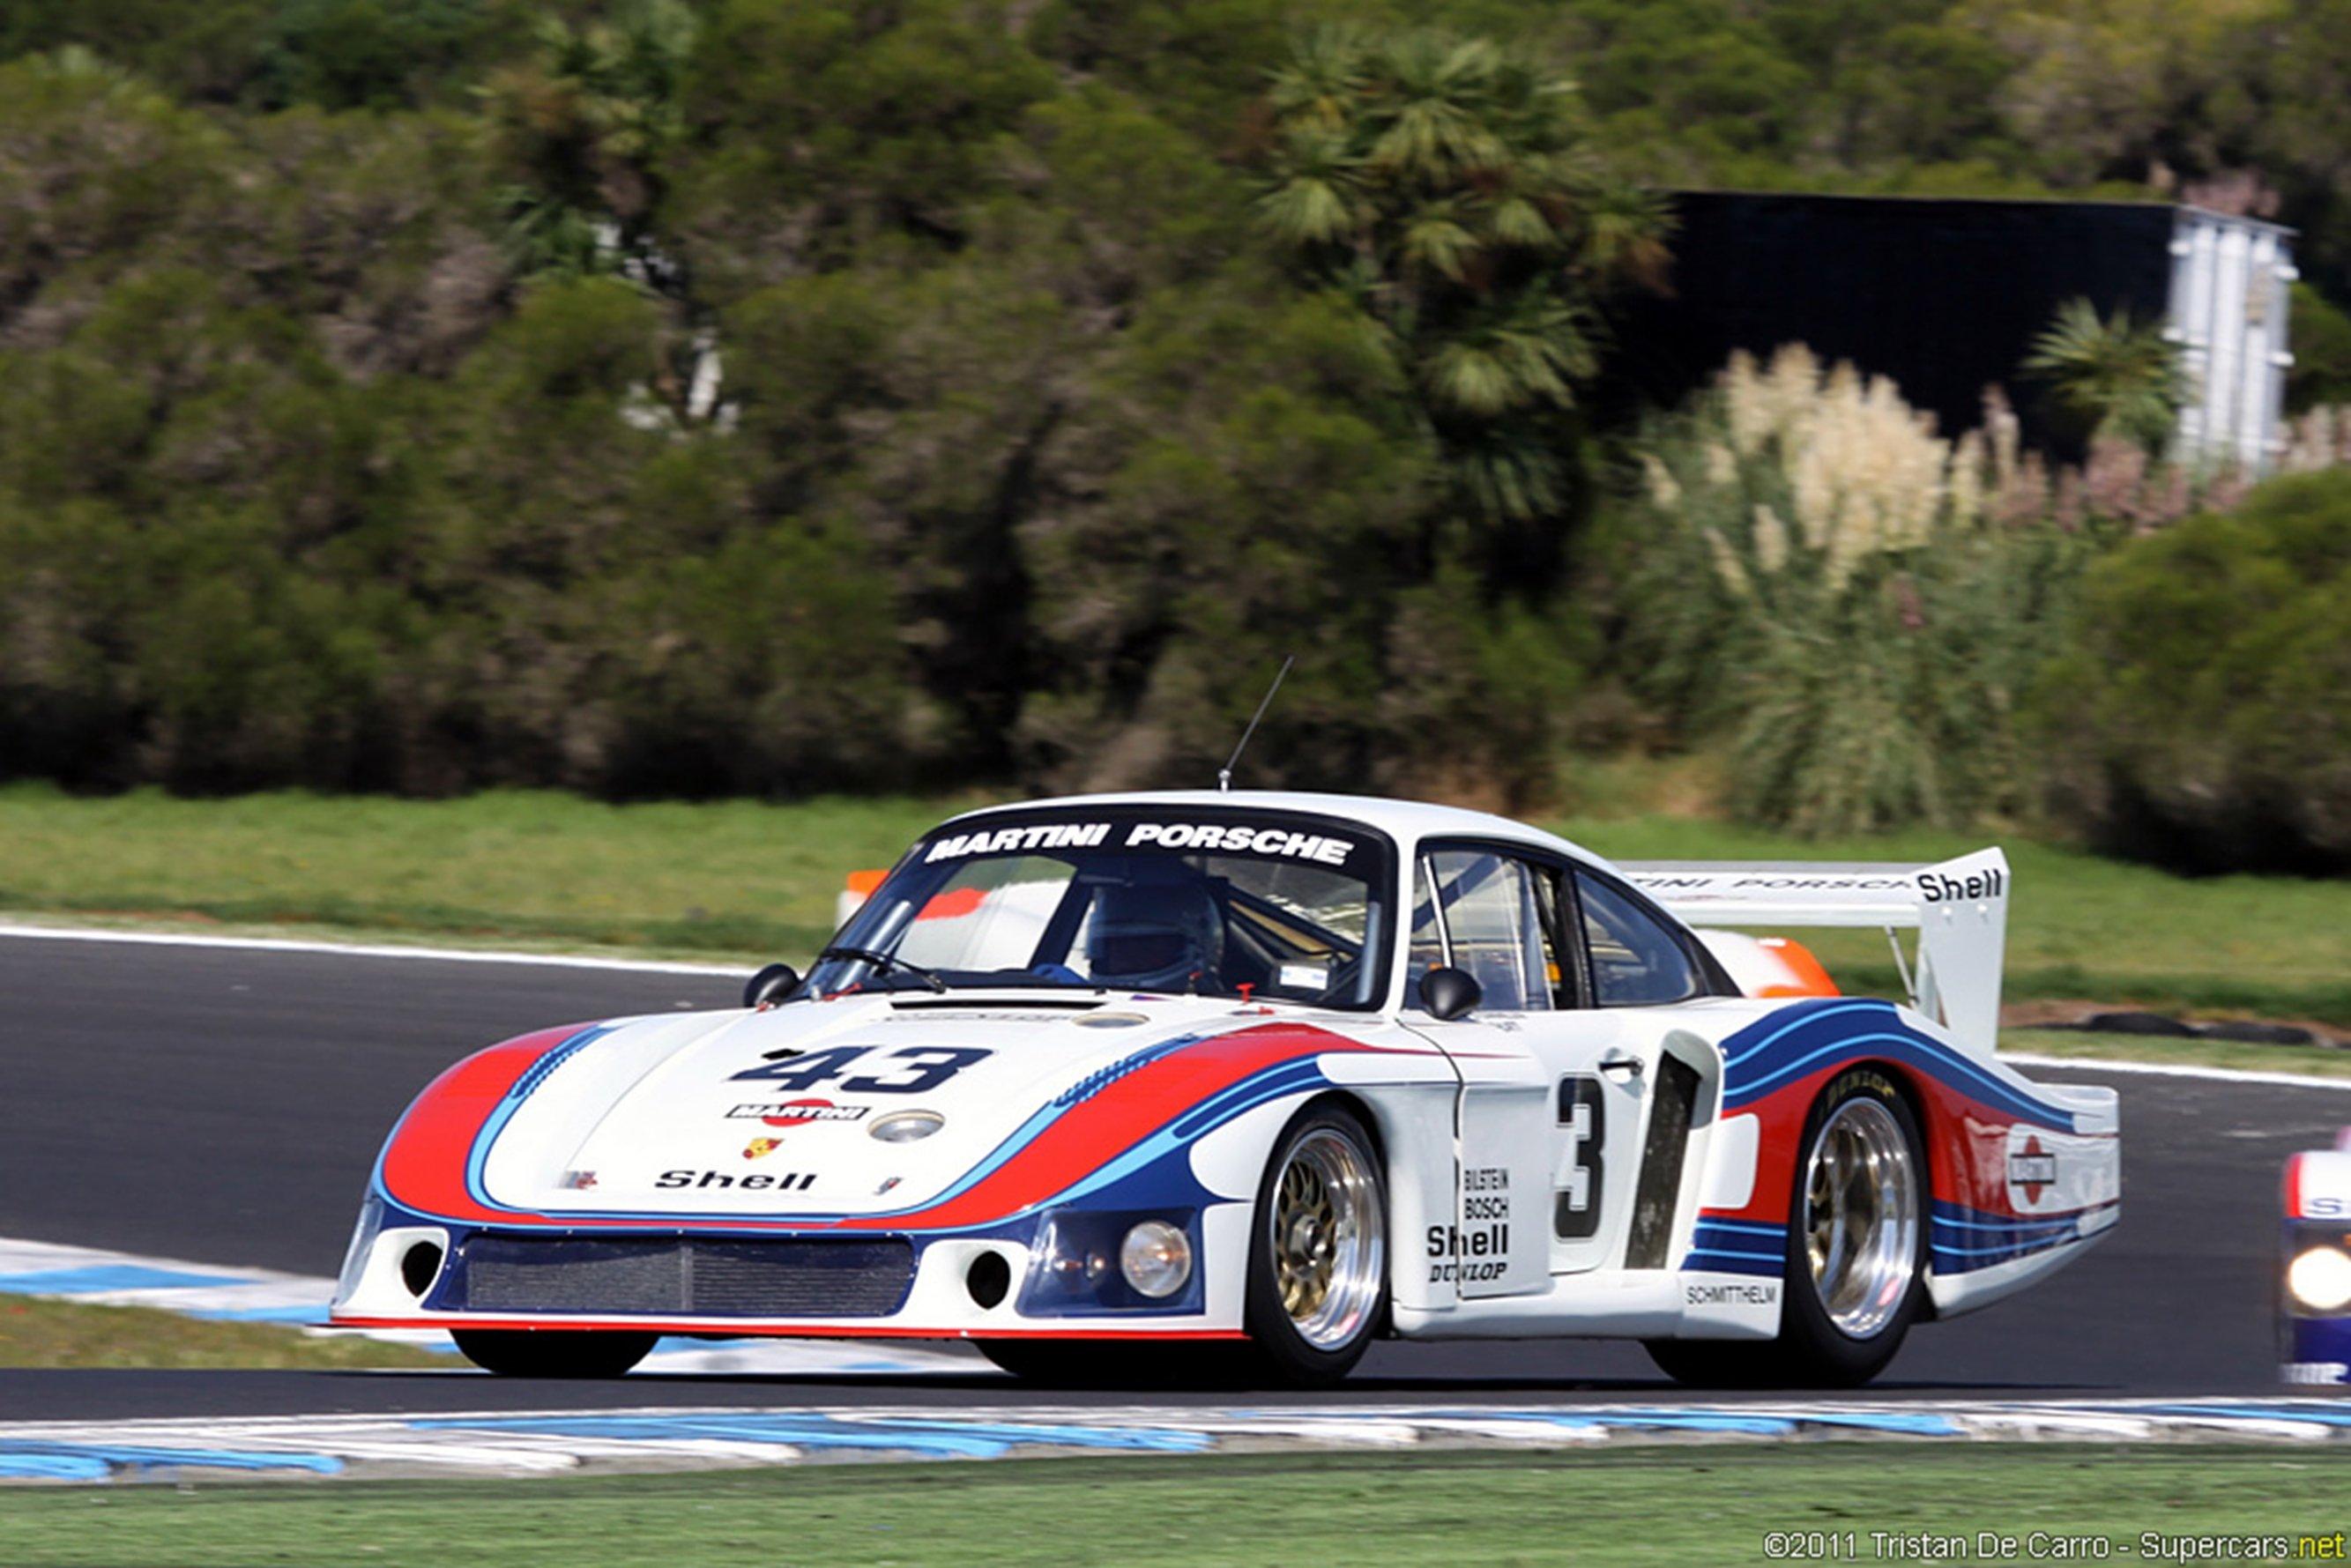 Race Car Classic Racing Porsche Martini 2667x1779 wallpaper ...